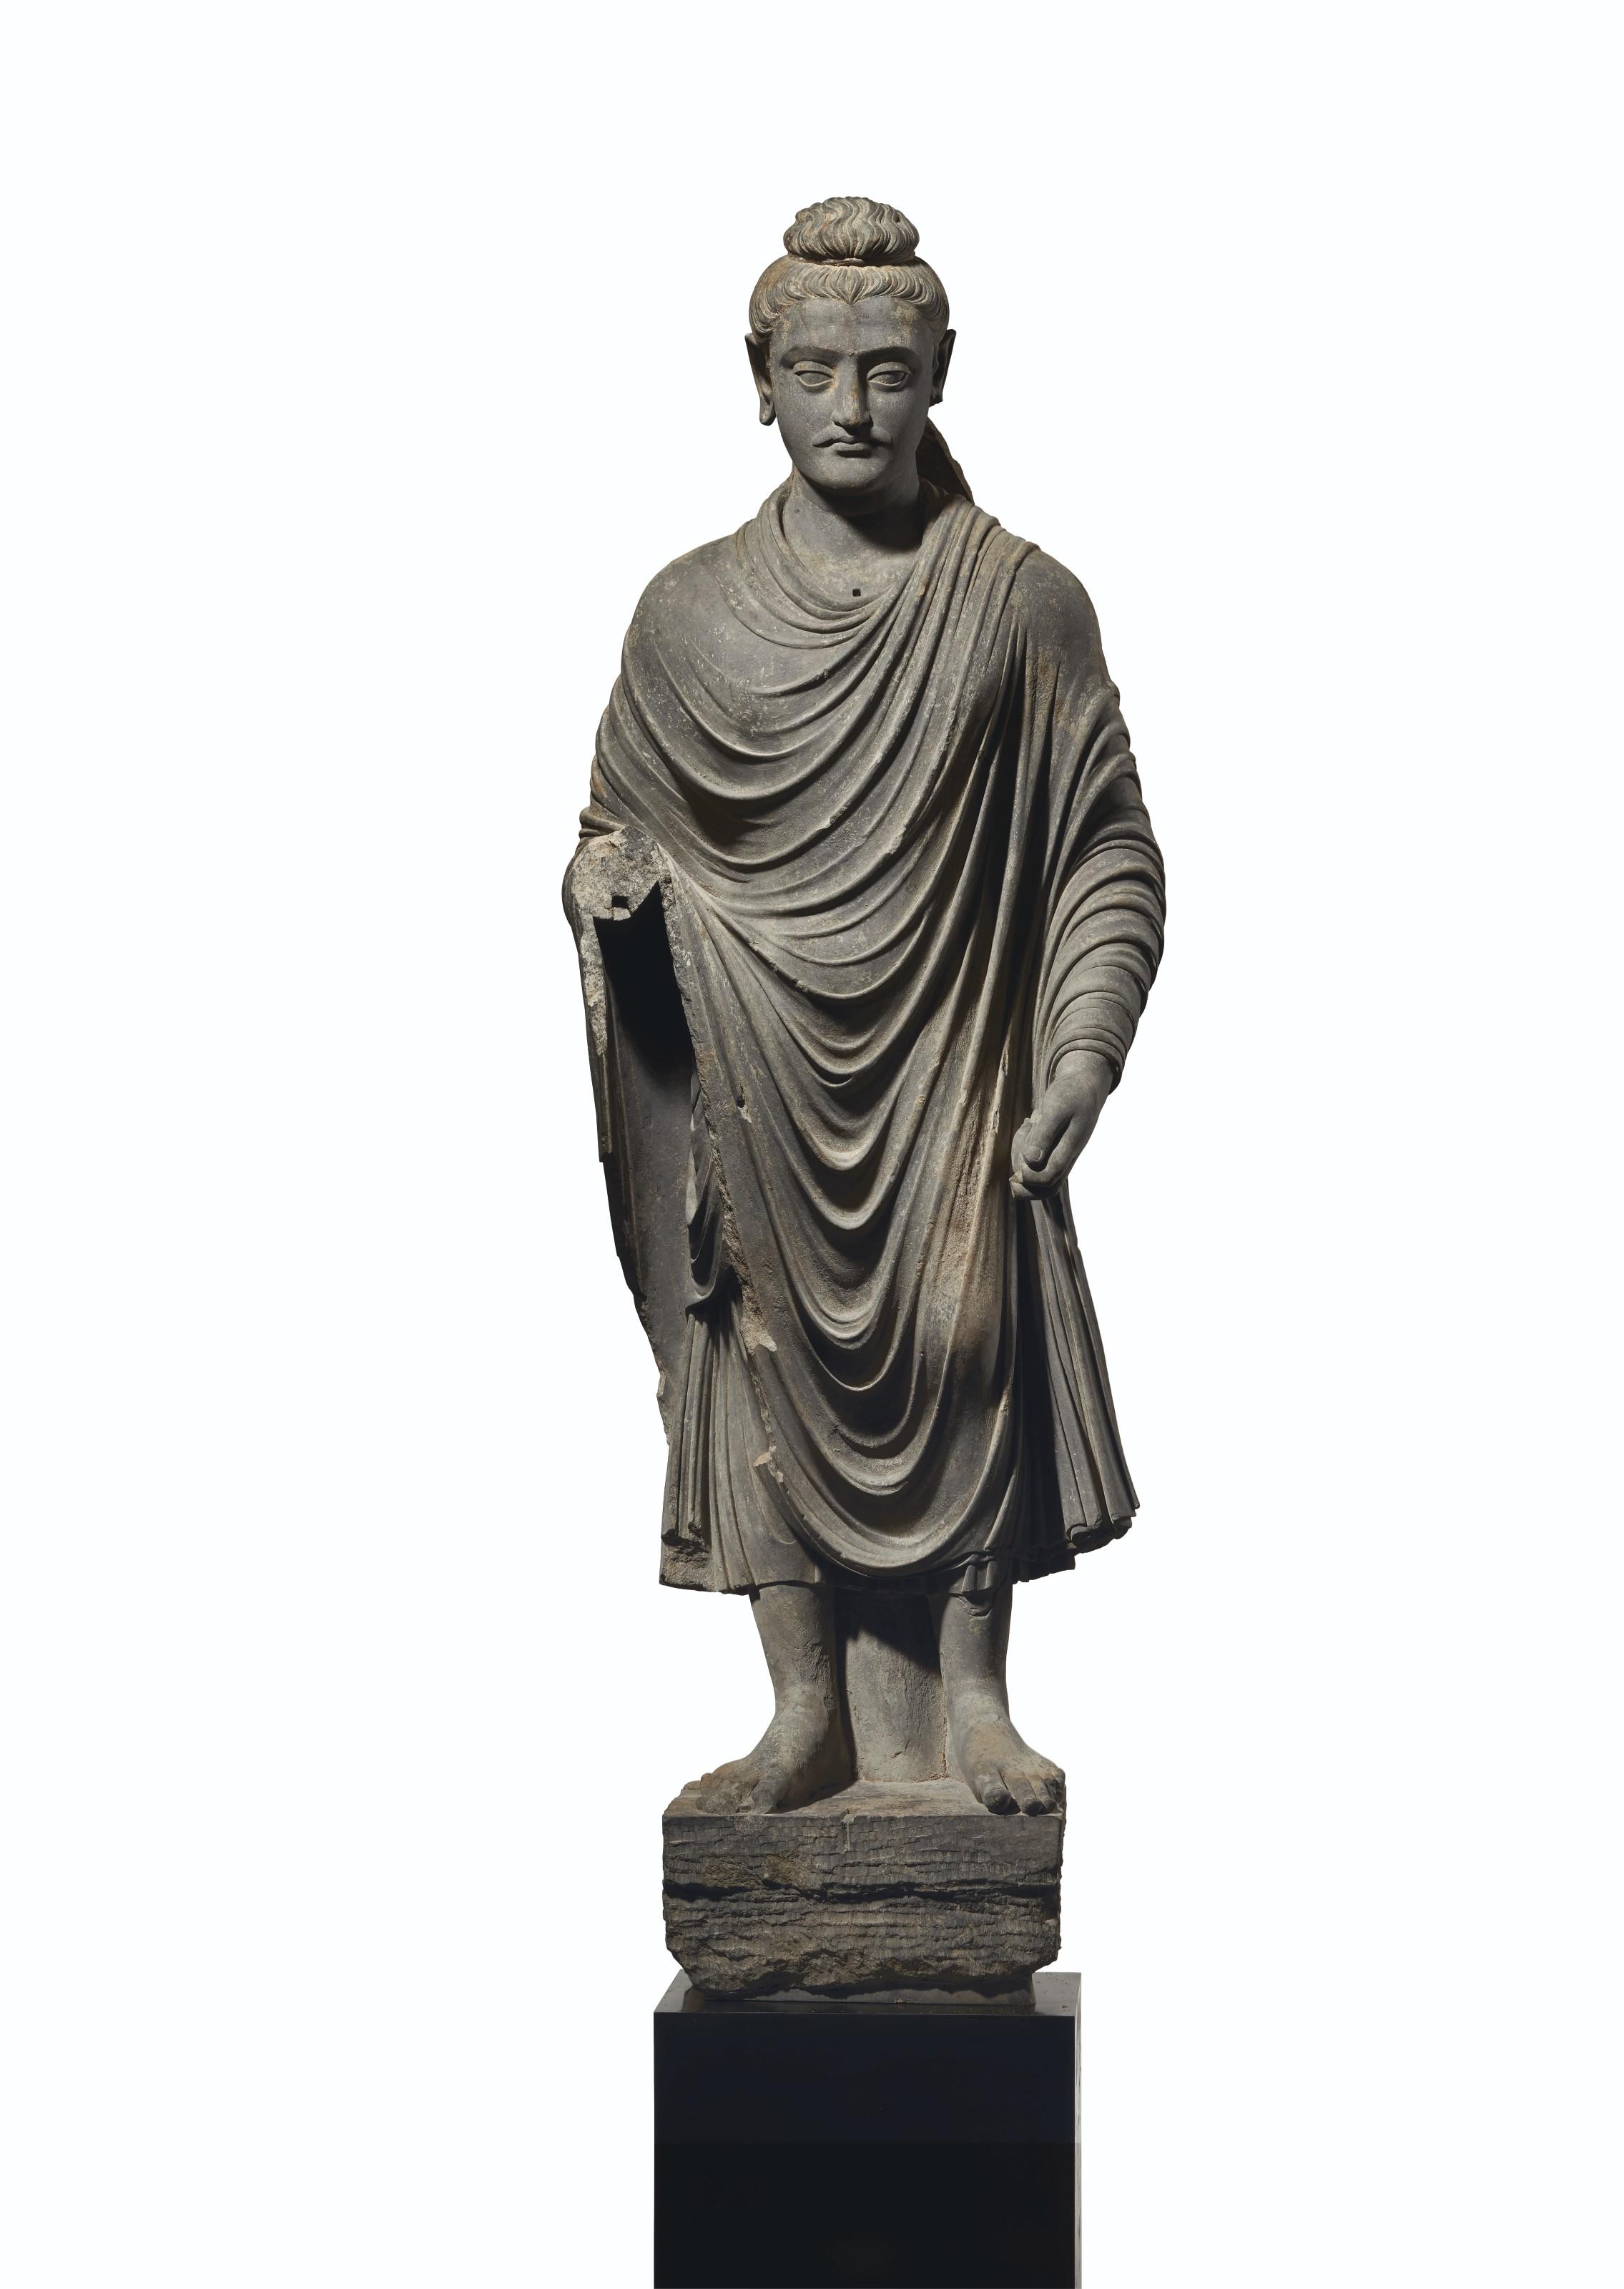 A MAGNIFICENT AND MONUMENTAL GRAY SCHIST FIGURE OF BUDDHA SHAKYAMUNI